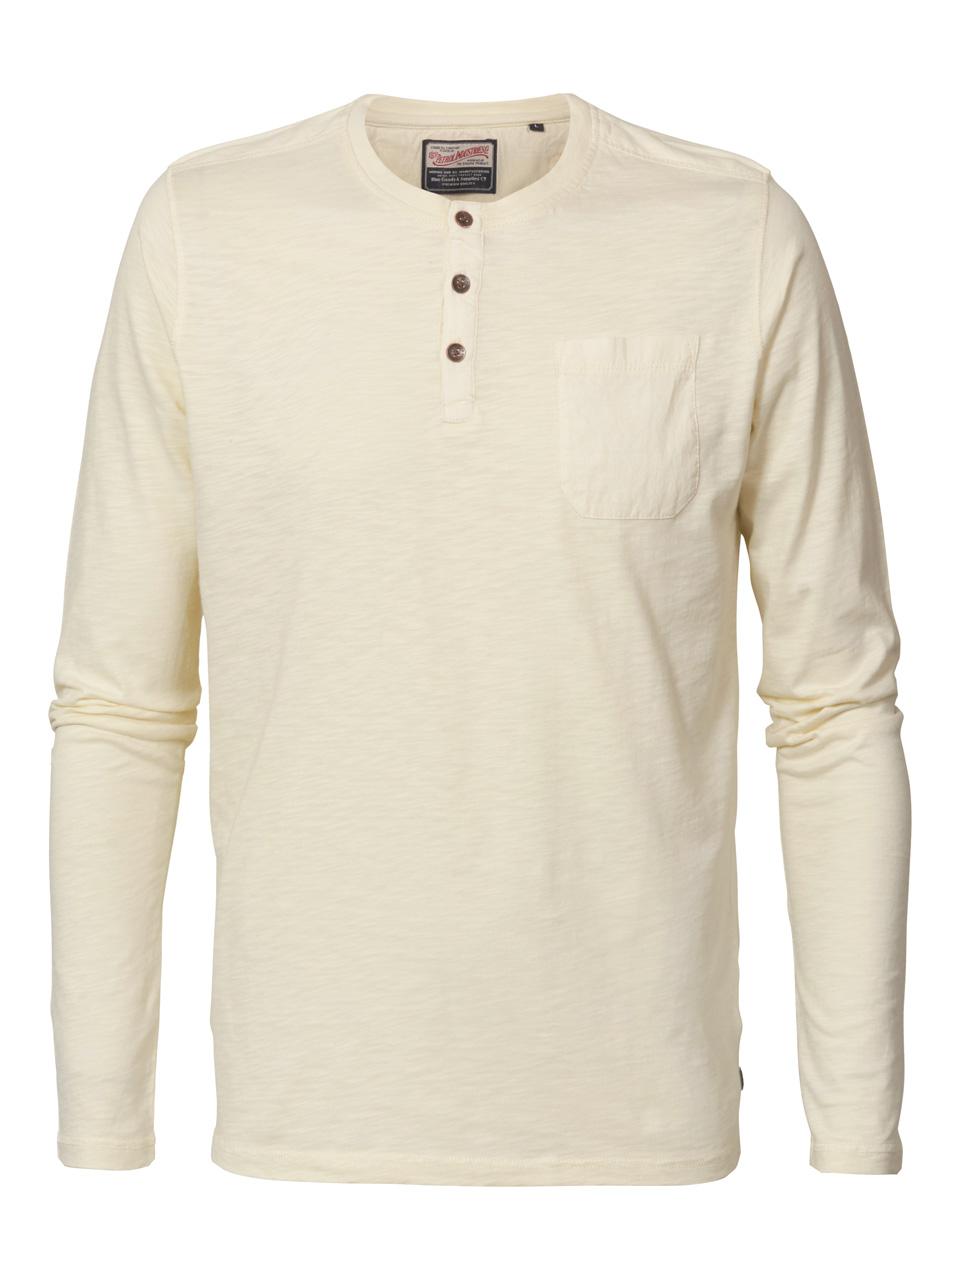 Tee shirt manche longue crème